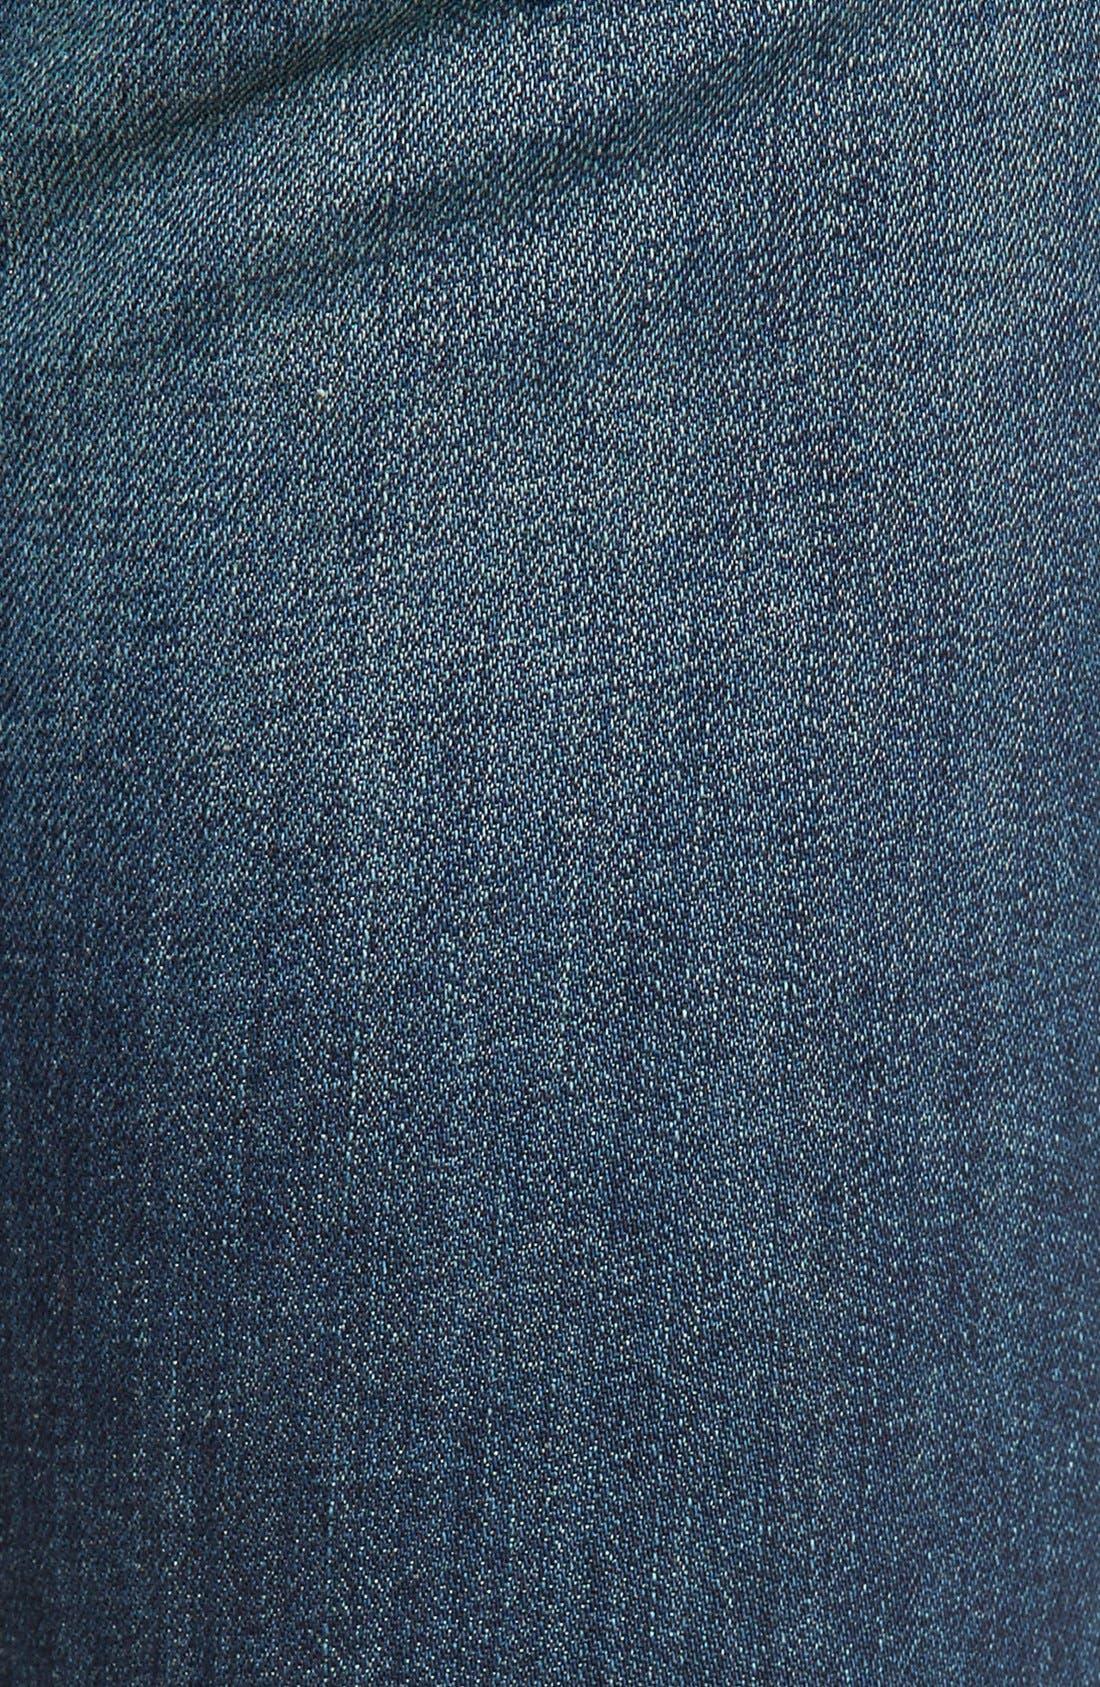 Alternate Image 5  - rag & bone/JEAN 'Tomboy' Boyfriend Skinny Jeans (Burnley)